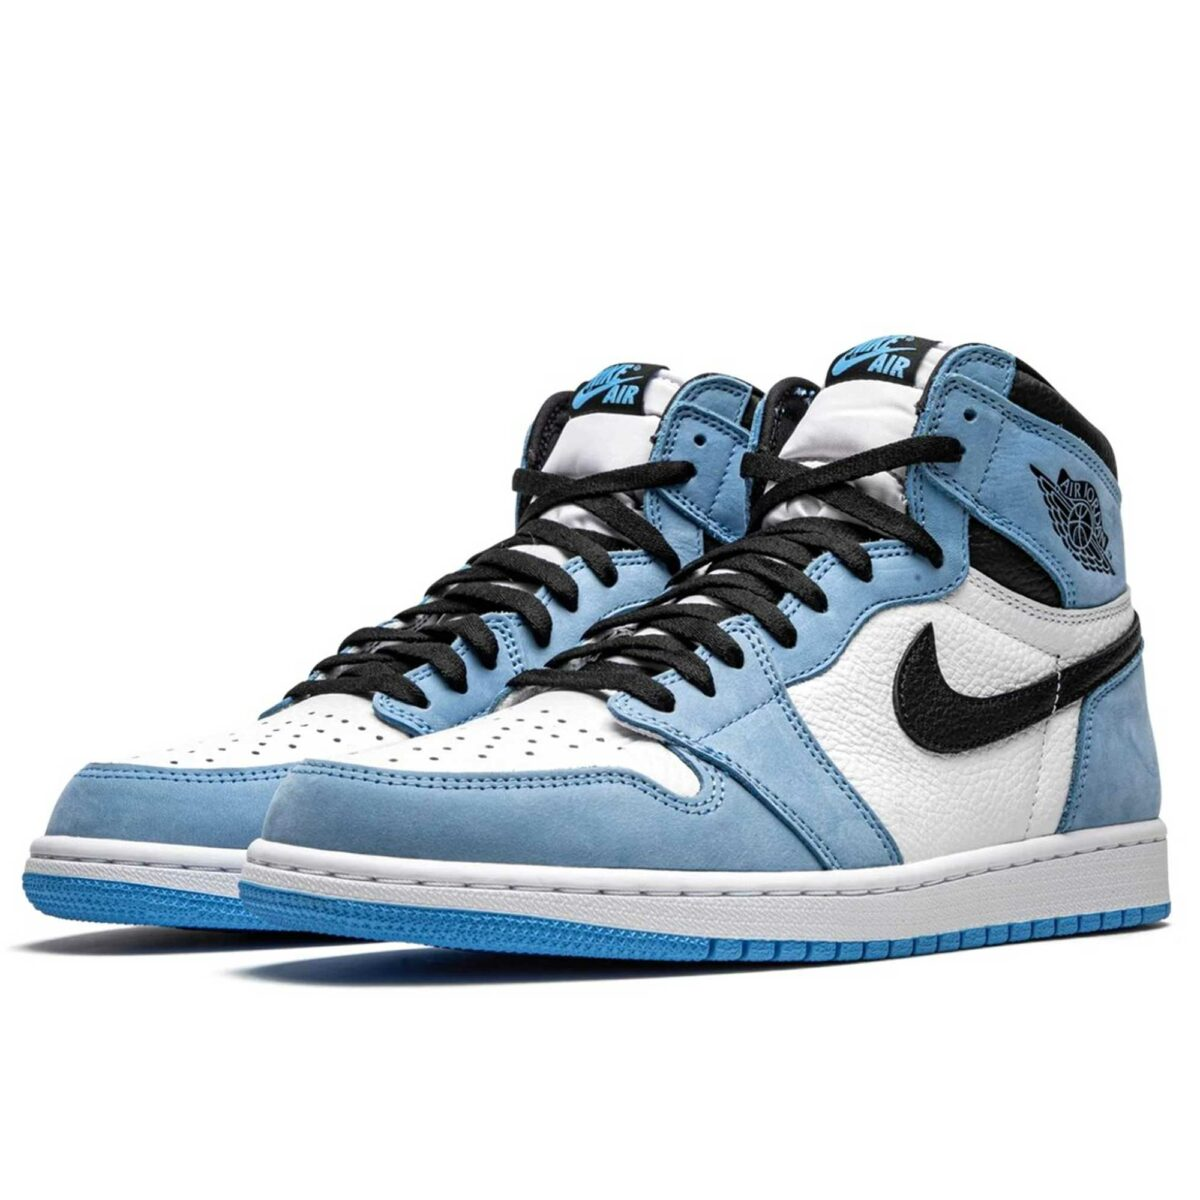 nike air Jordan 1 retro high university blue 555088_134 купить